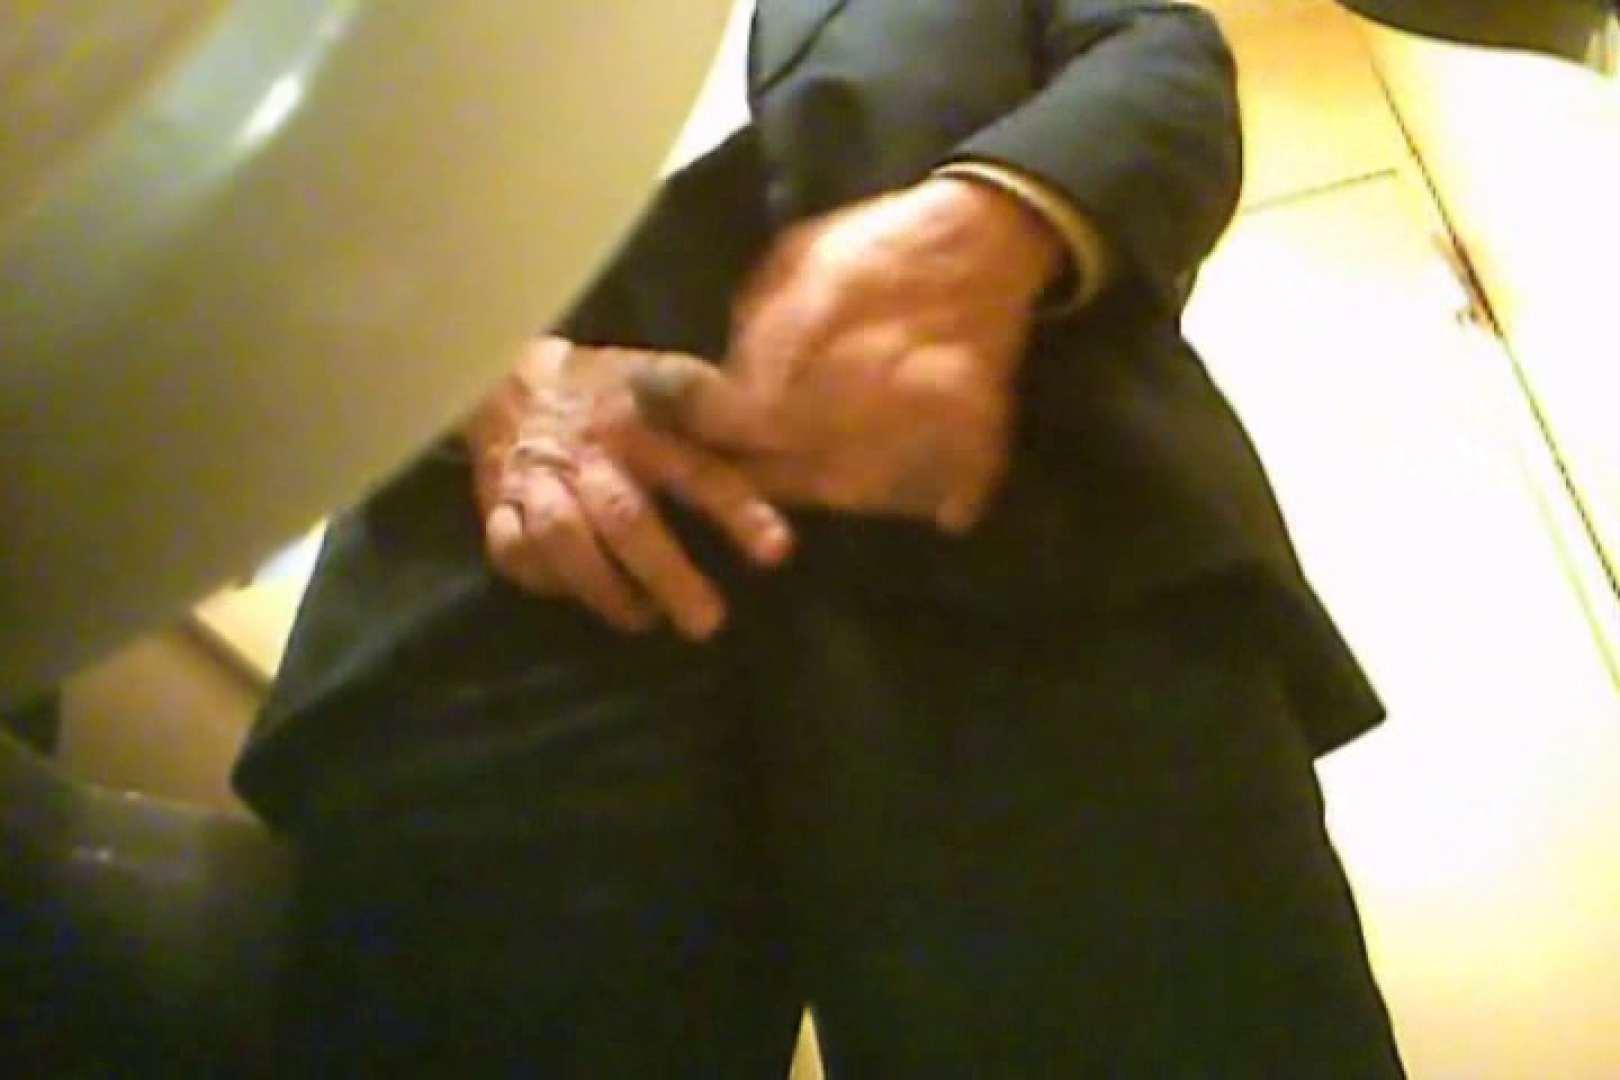 SEASON 3rd!掴み取りさんの洗面所覗き!in新幹線!VOL.21 念願の完全無修正 ゲイ射精画像 108連発 18